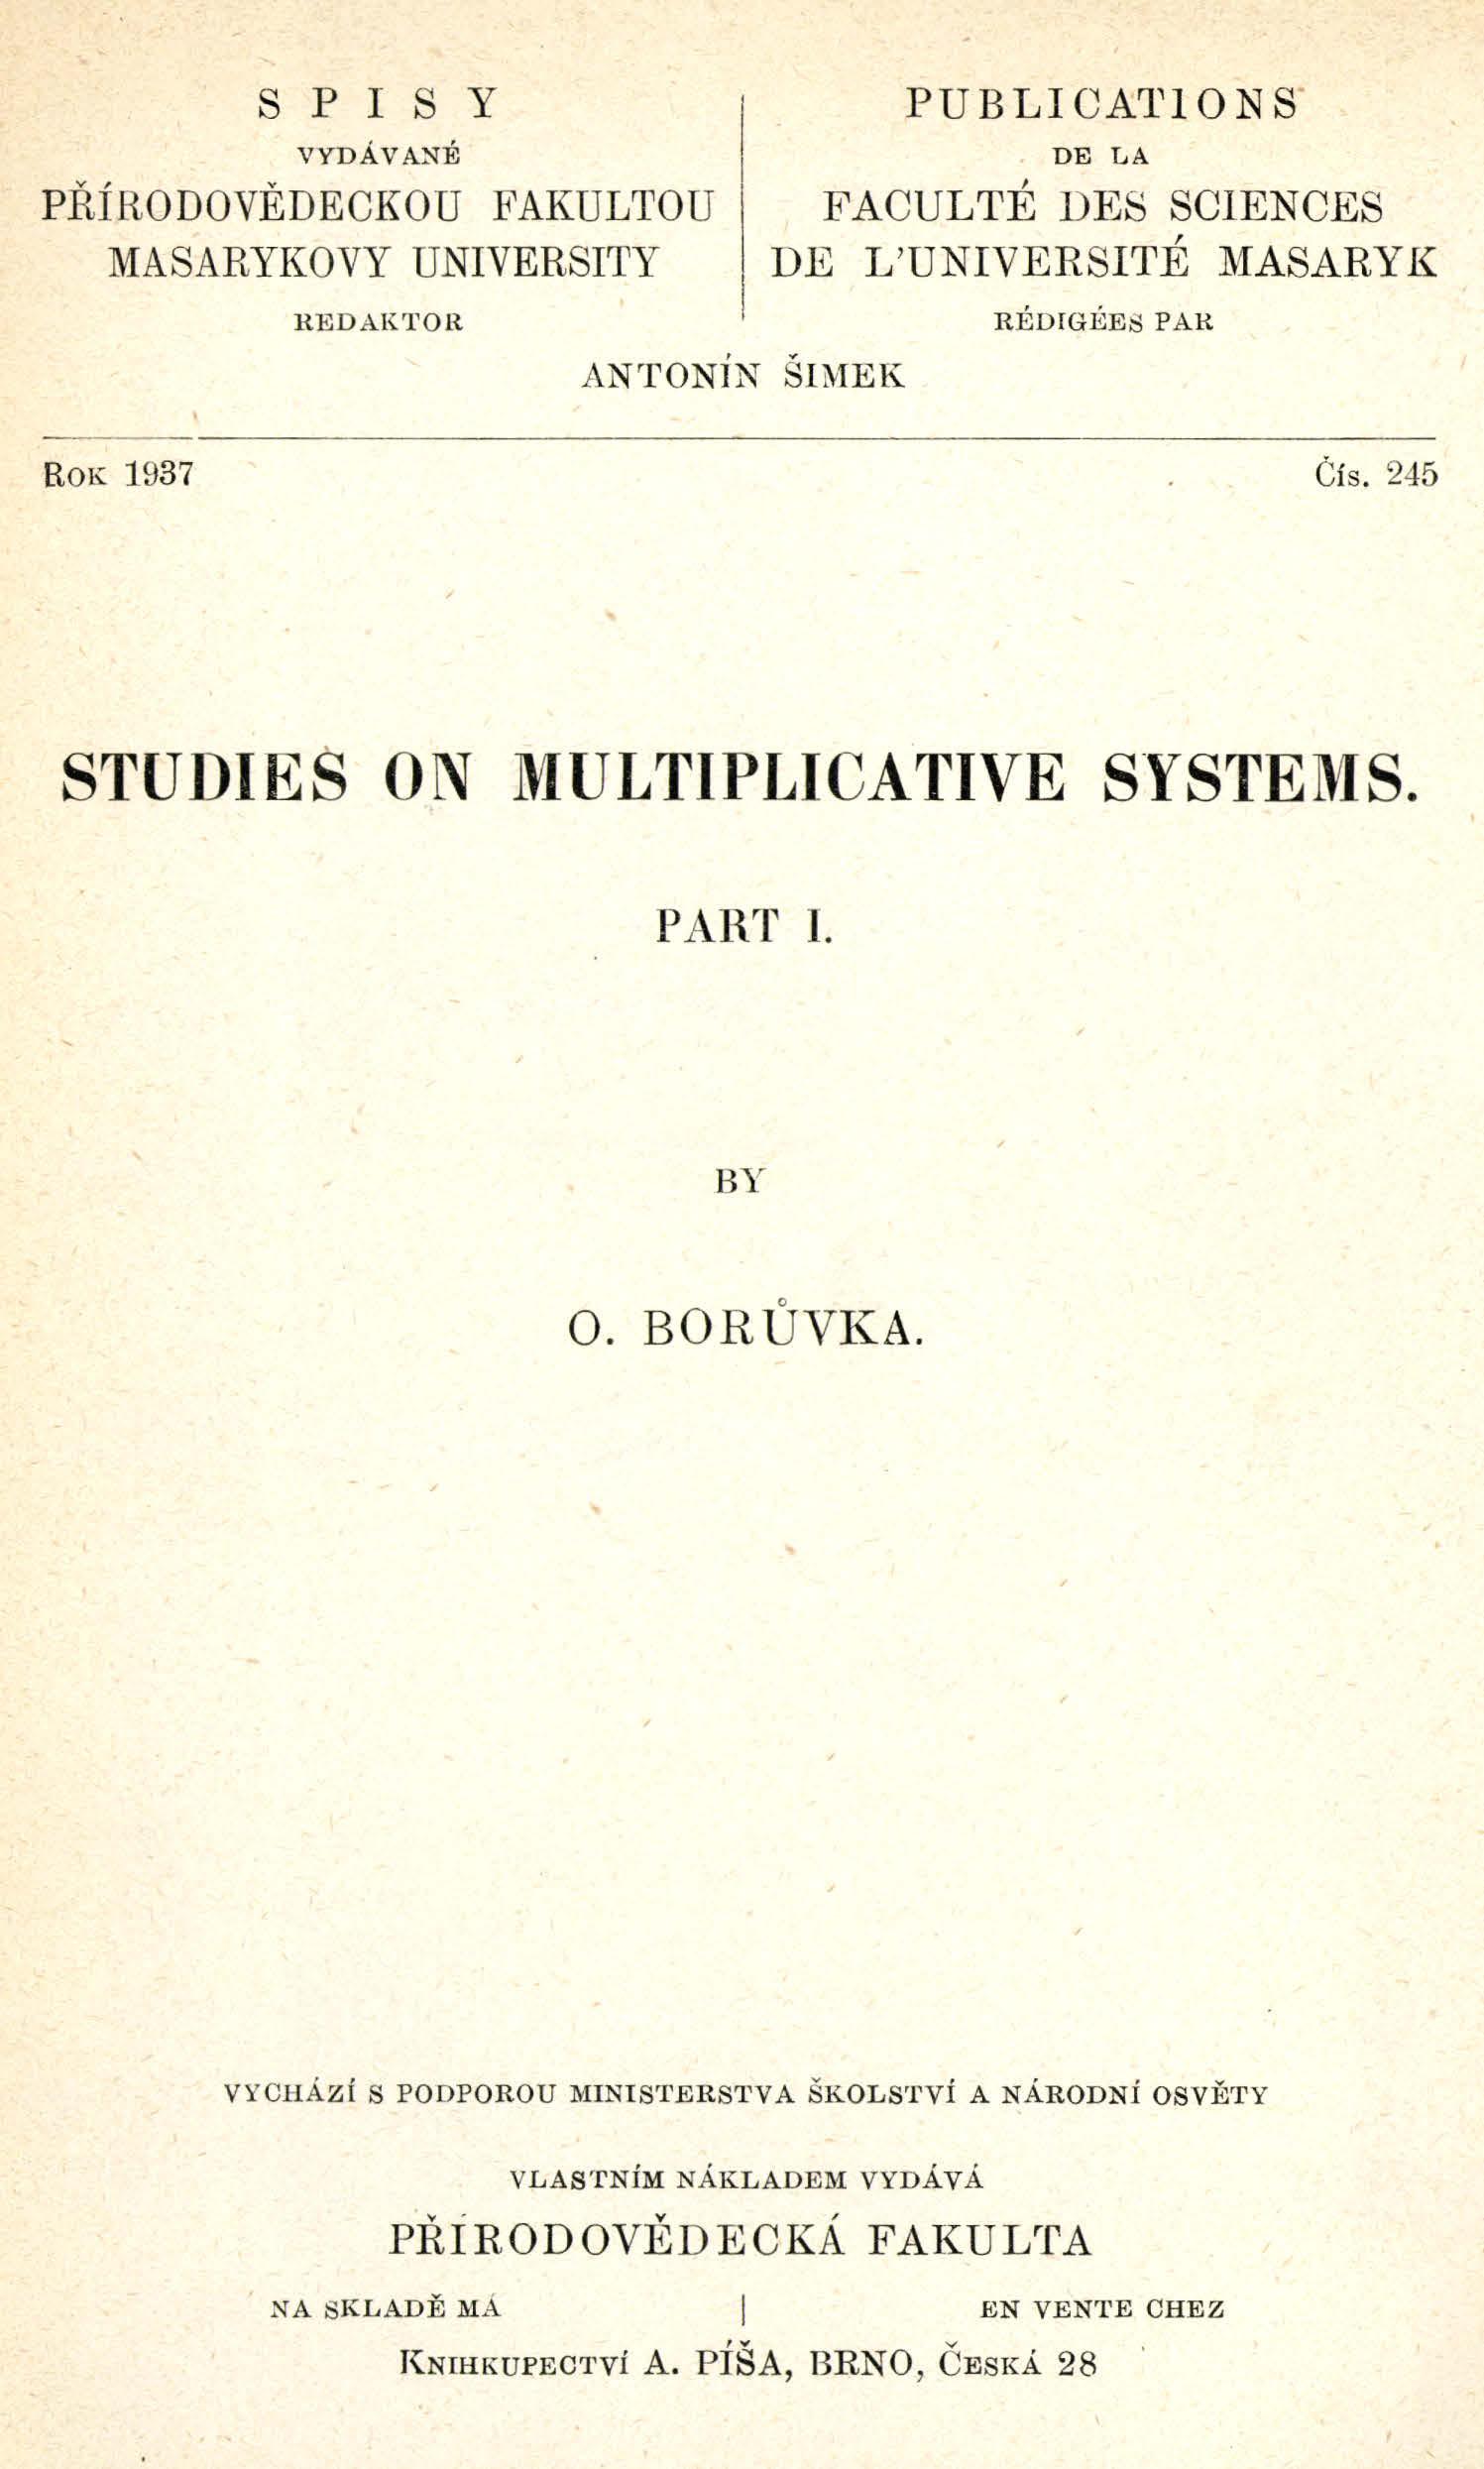 Obálka pro Studies on multiplicative systems. Part I